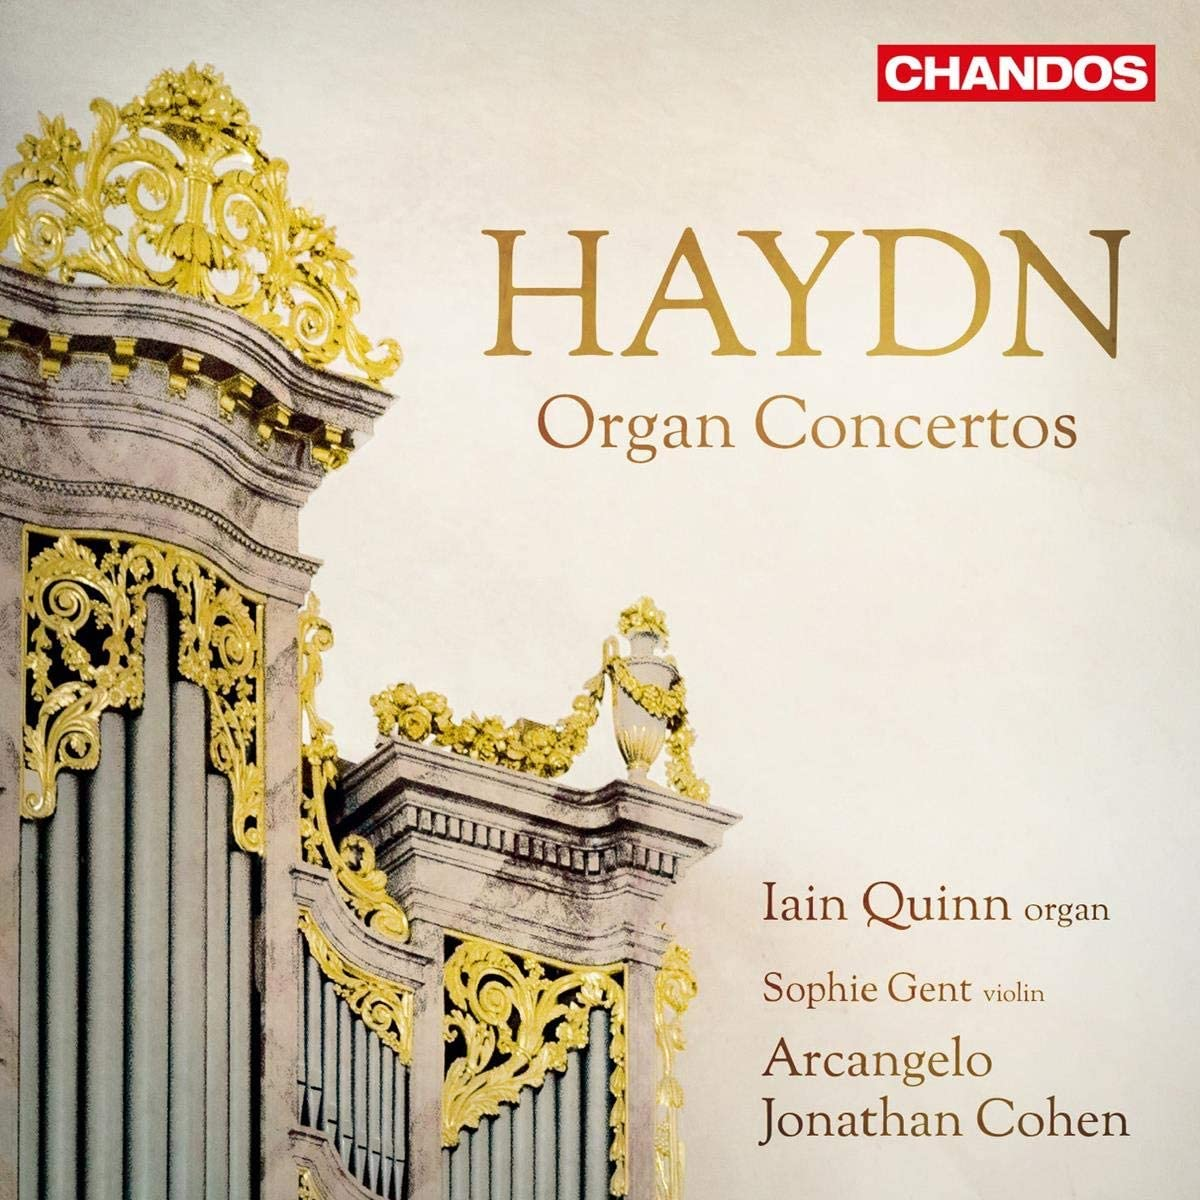 Haydn: Organ Concertos [Arcangelo; Ian Quinn; Sophie Gent ...